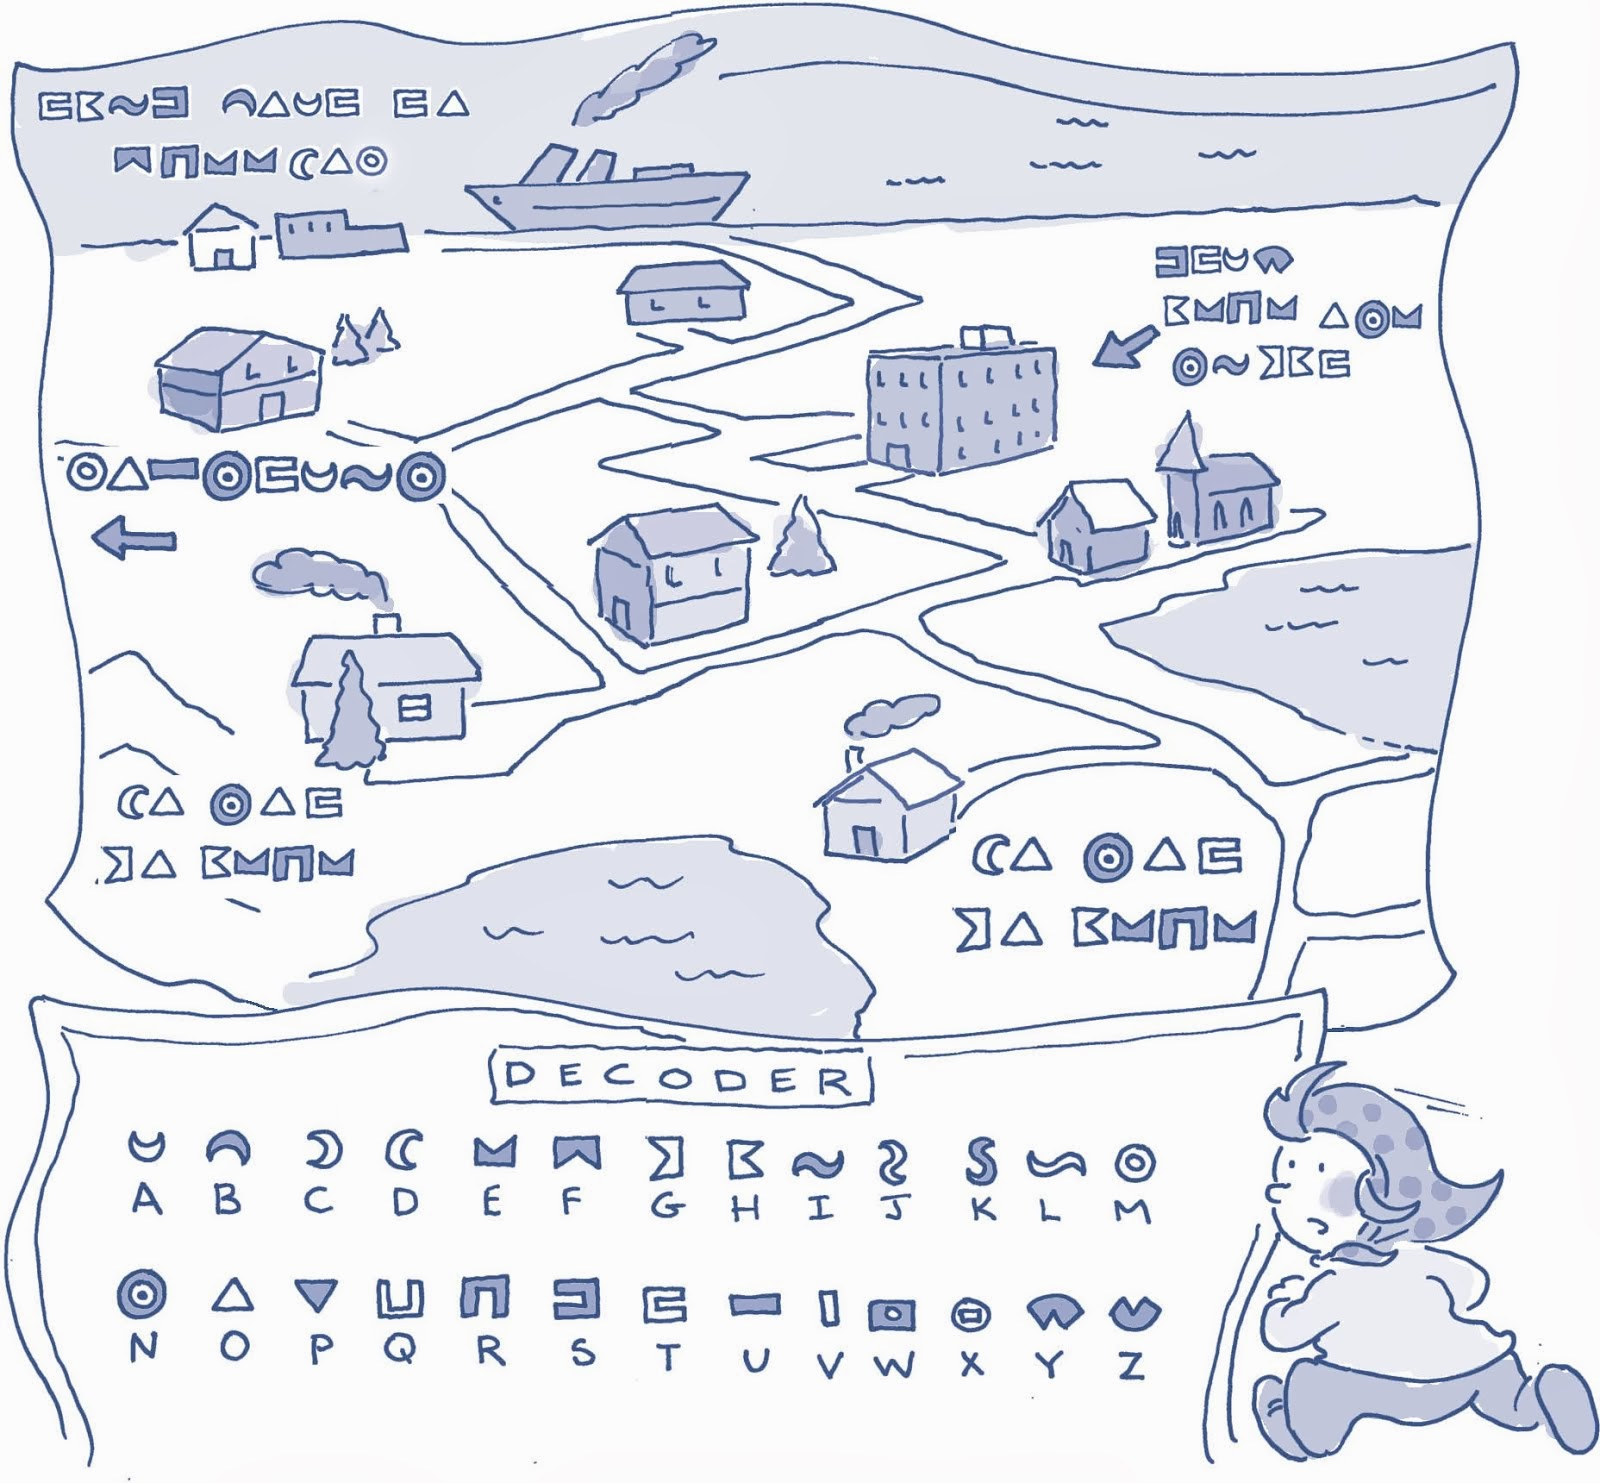 I Spy Worksheet For Preschoolers